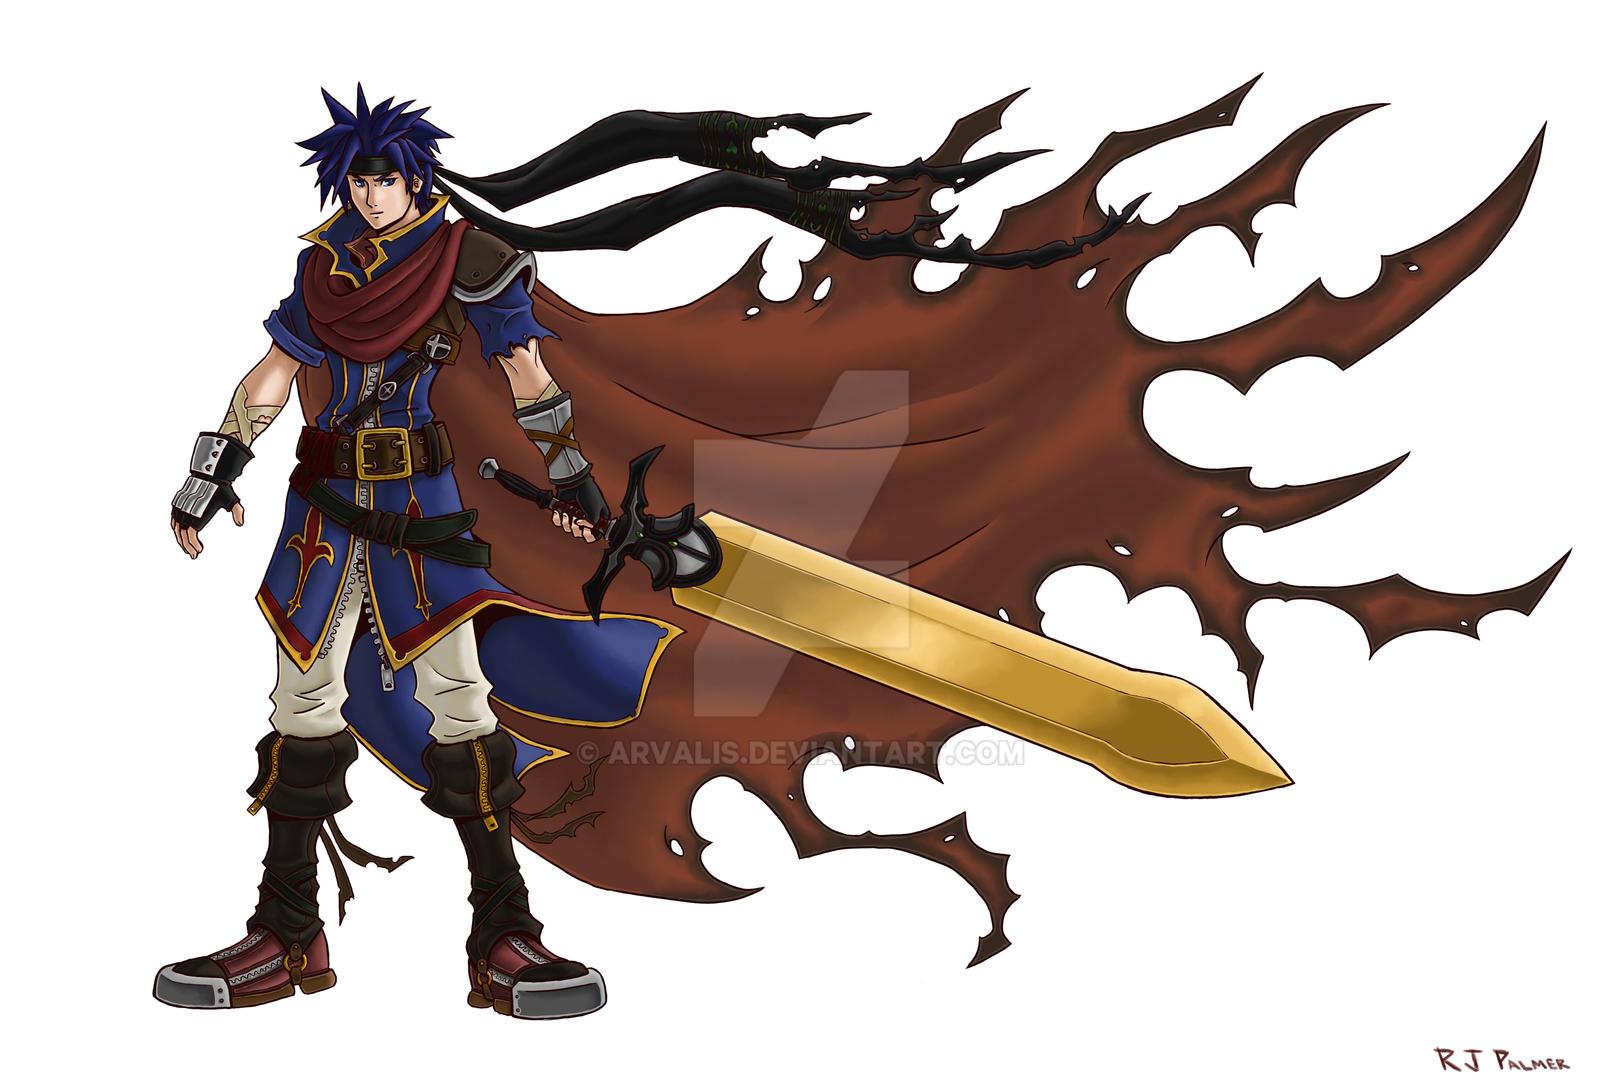 Sora Kingdom Hearts Lineart : Kingdom hearts ike lines by arvalis on deviantart